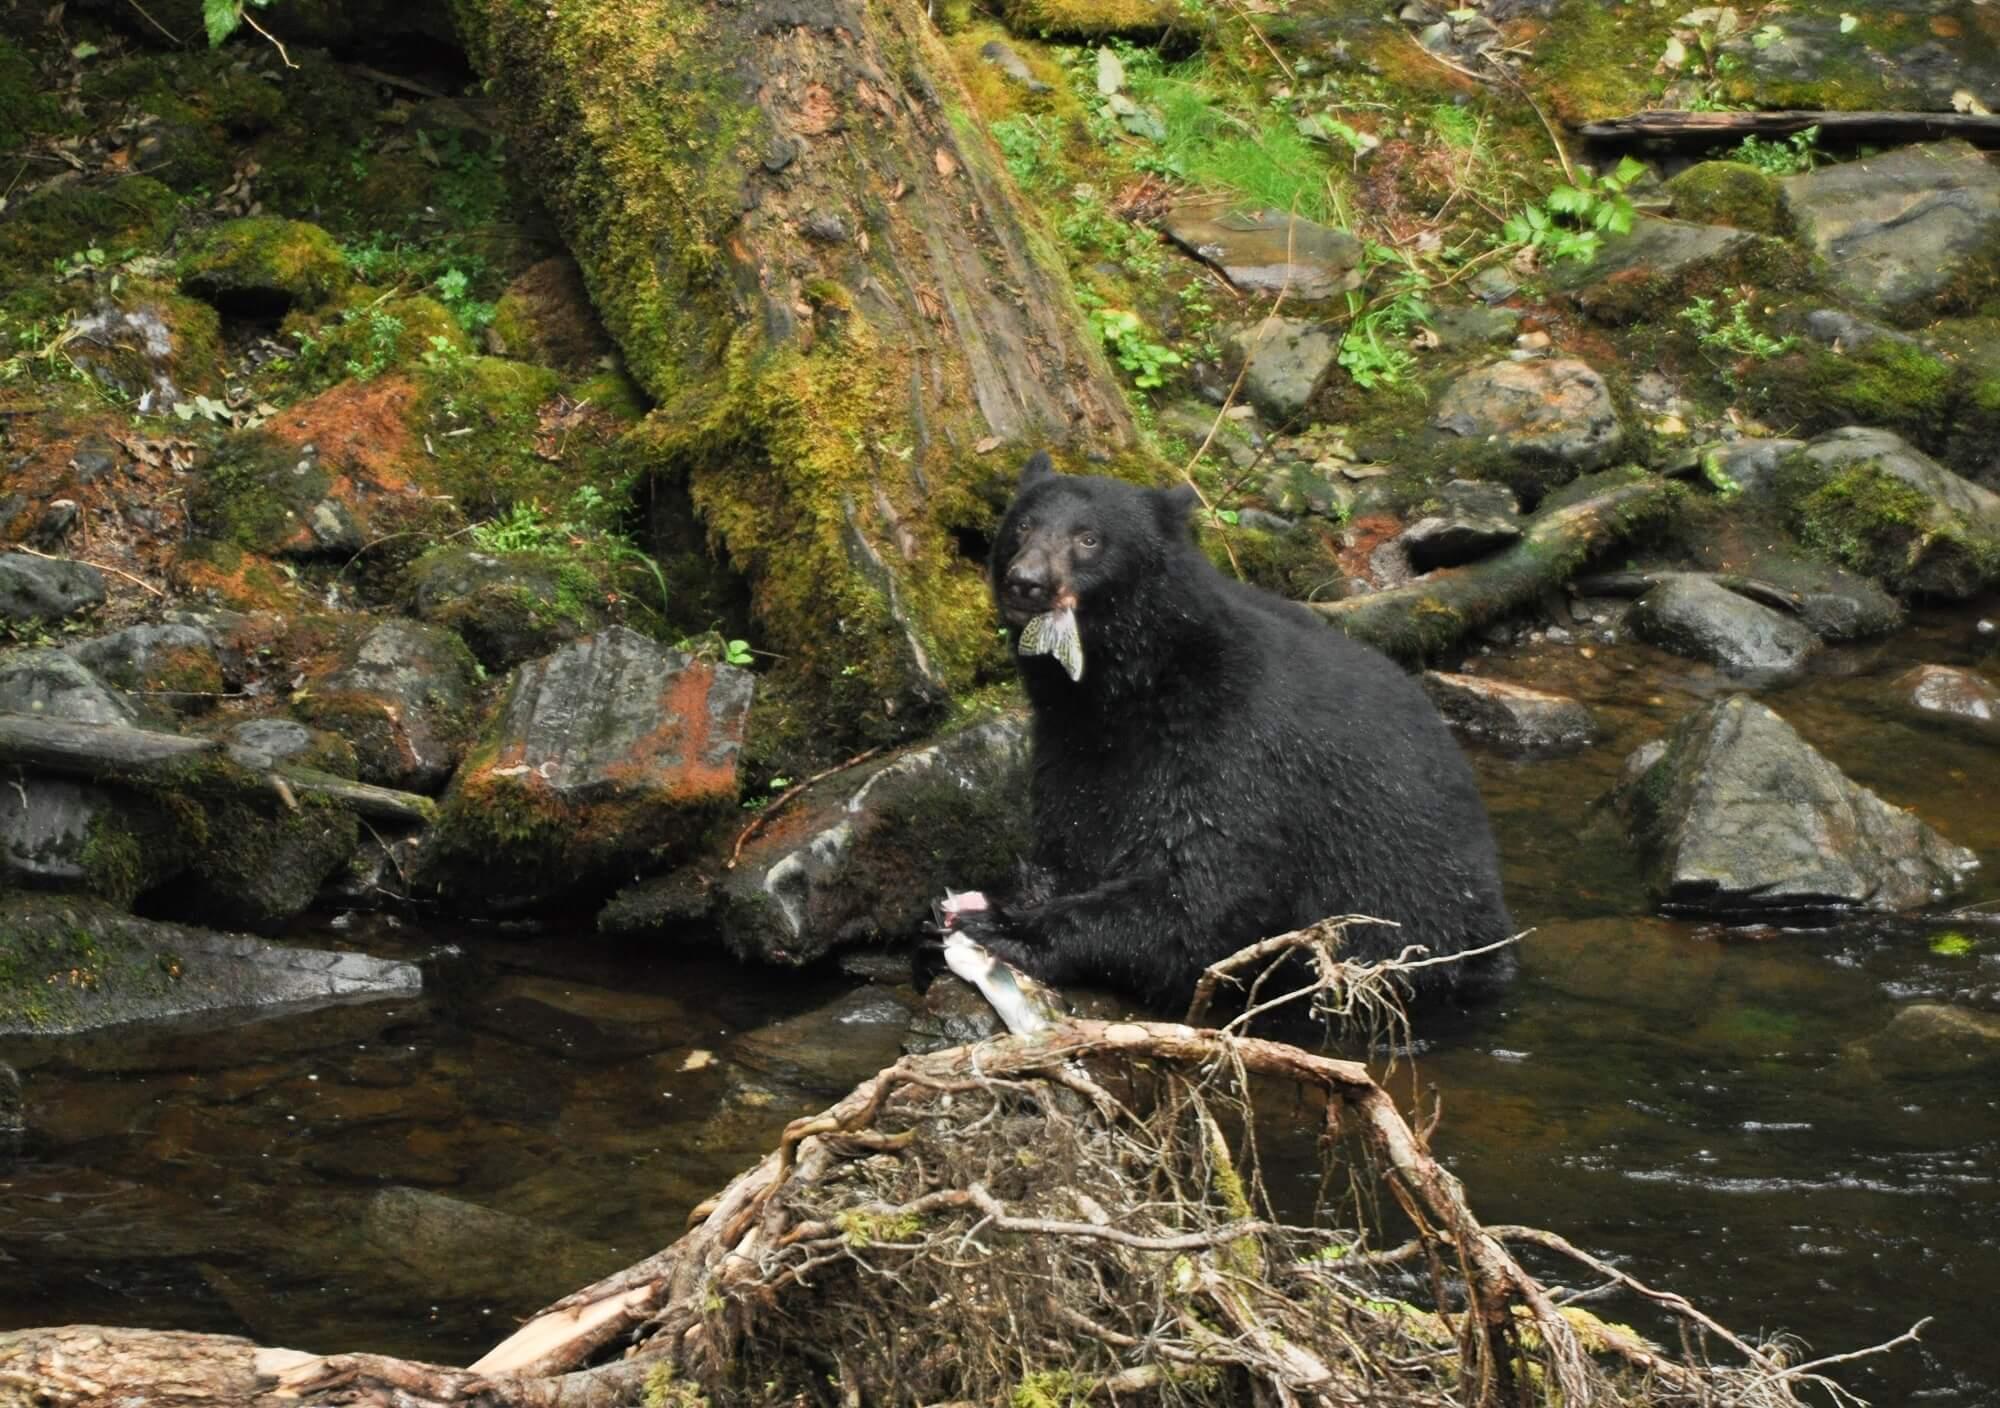 https://www.kawanti.com/wp-content/uploads/2018/11/Alaska-Bear-Black-Bear-with-salmon-tail.jpg